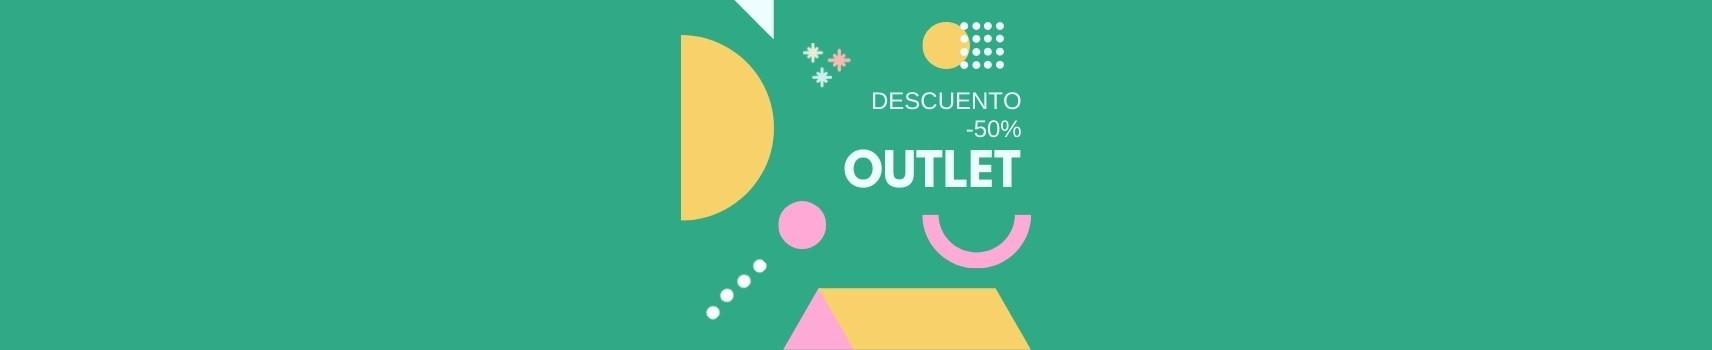 DESCUENTO -50%